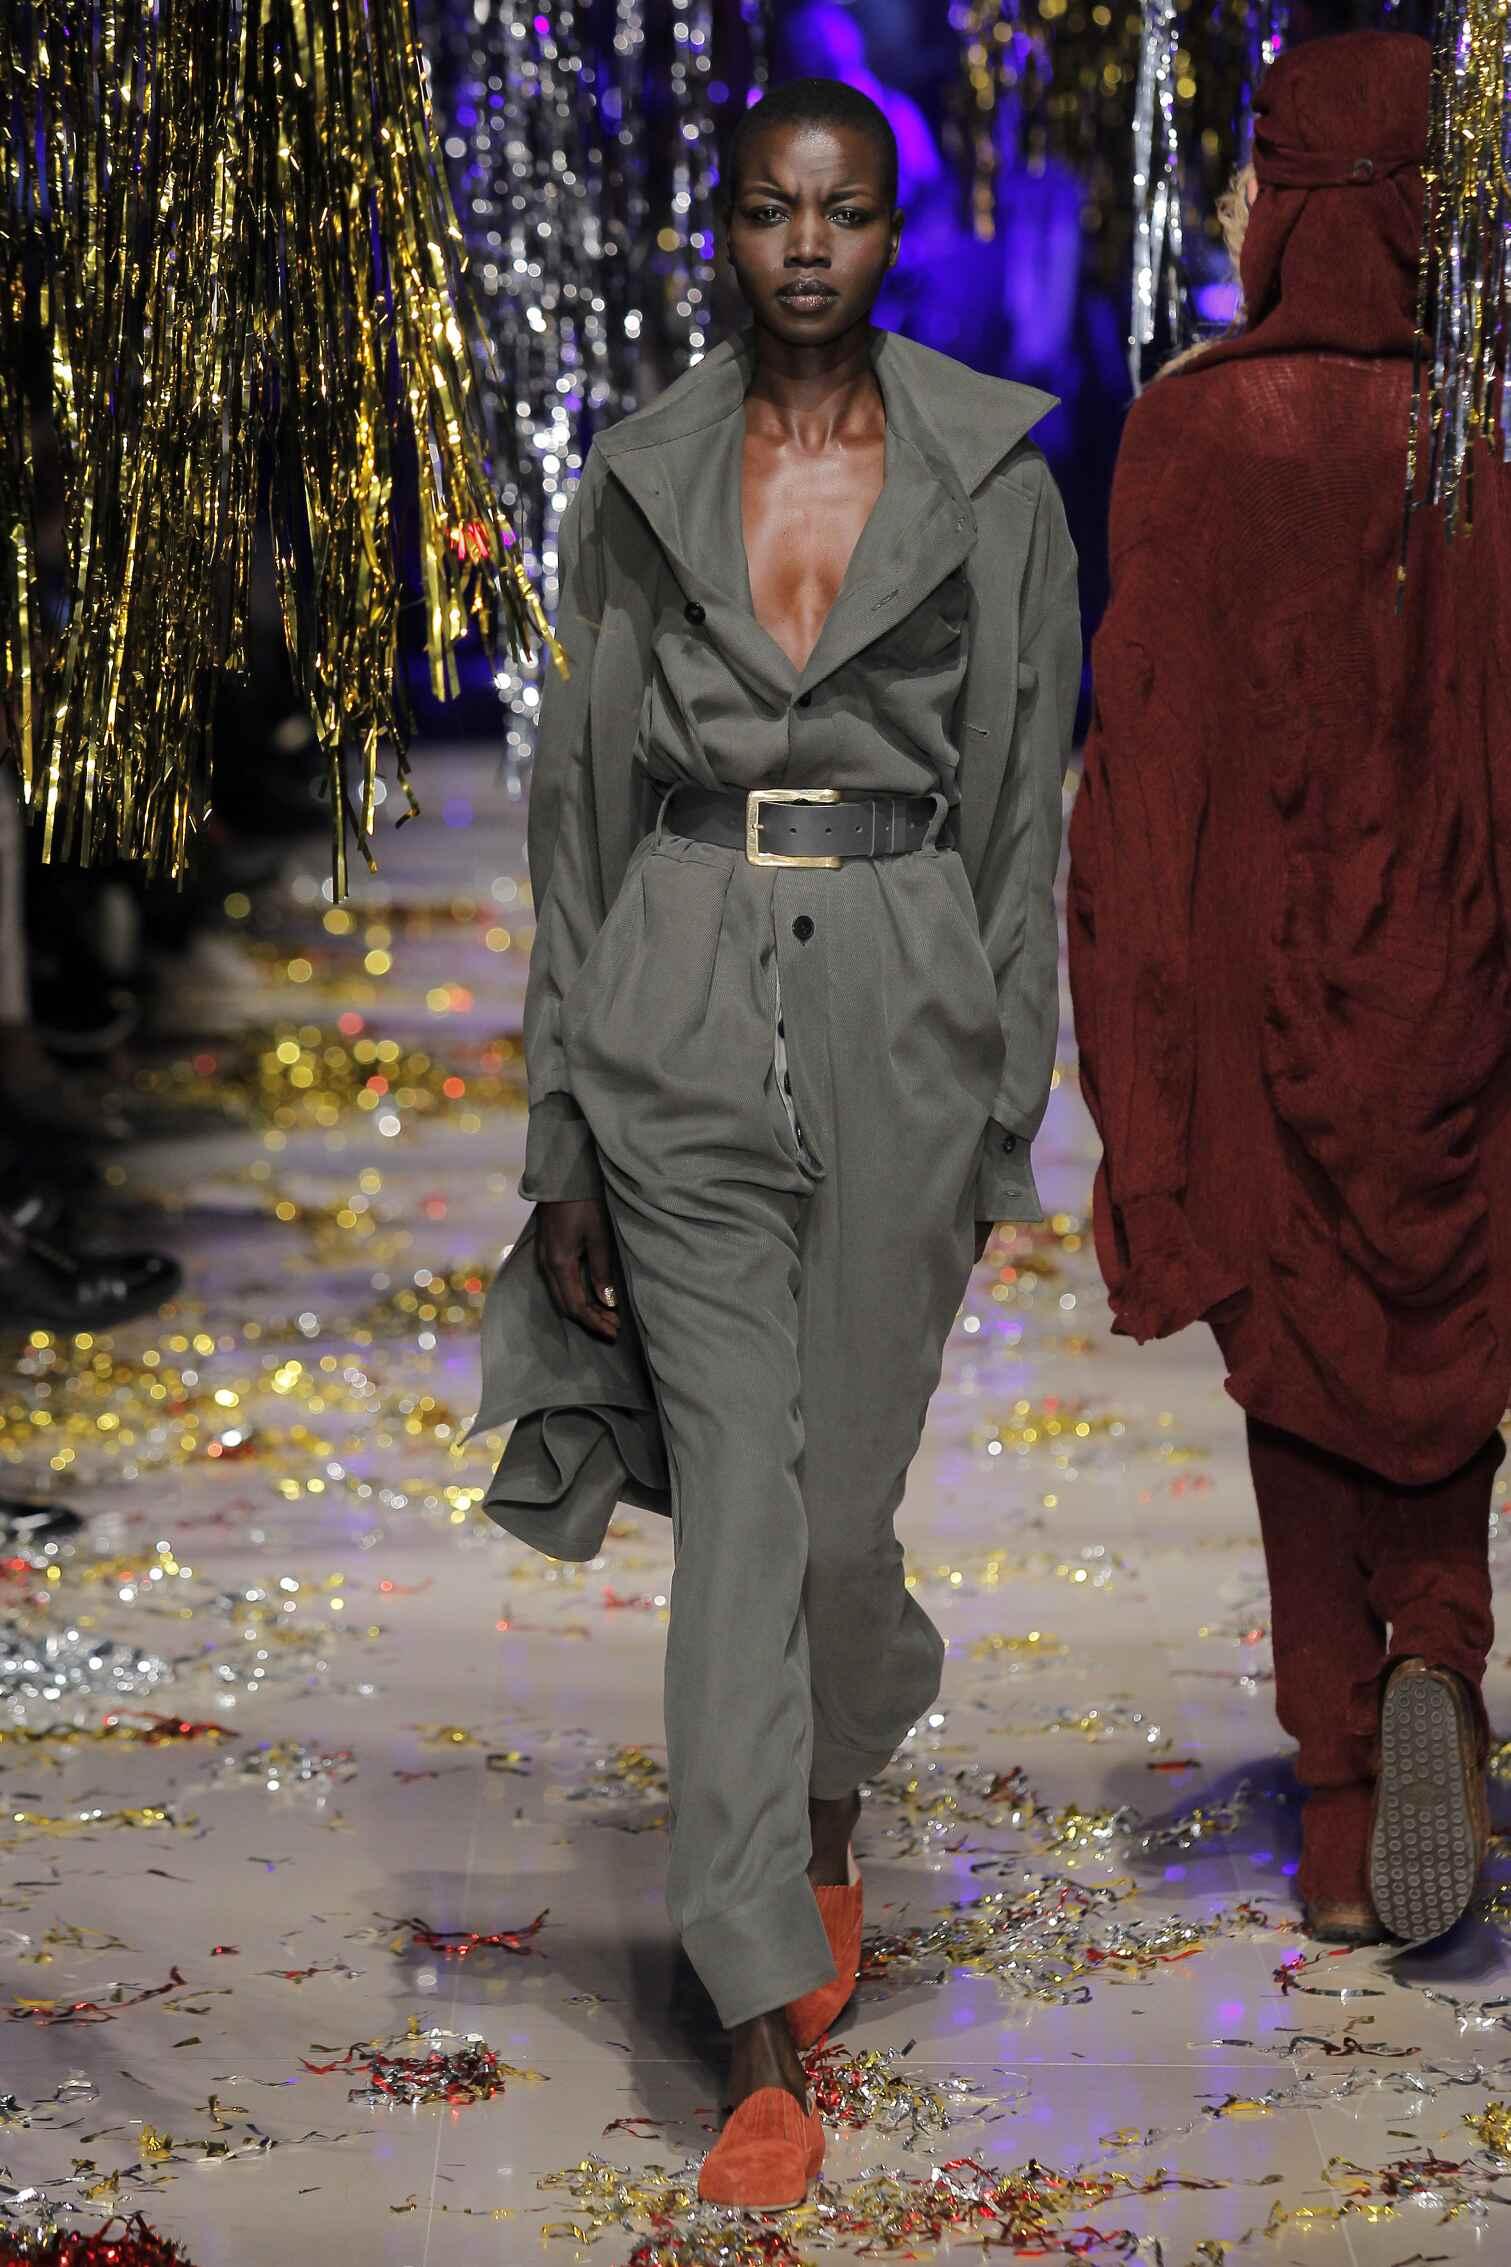 2015 Fashion Woman Model Vivienne Westwood Gold Label Collection Catwalk